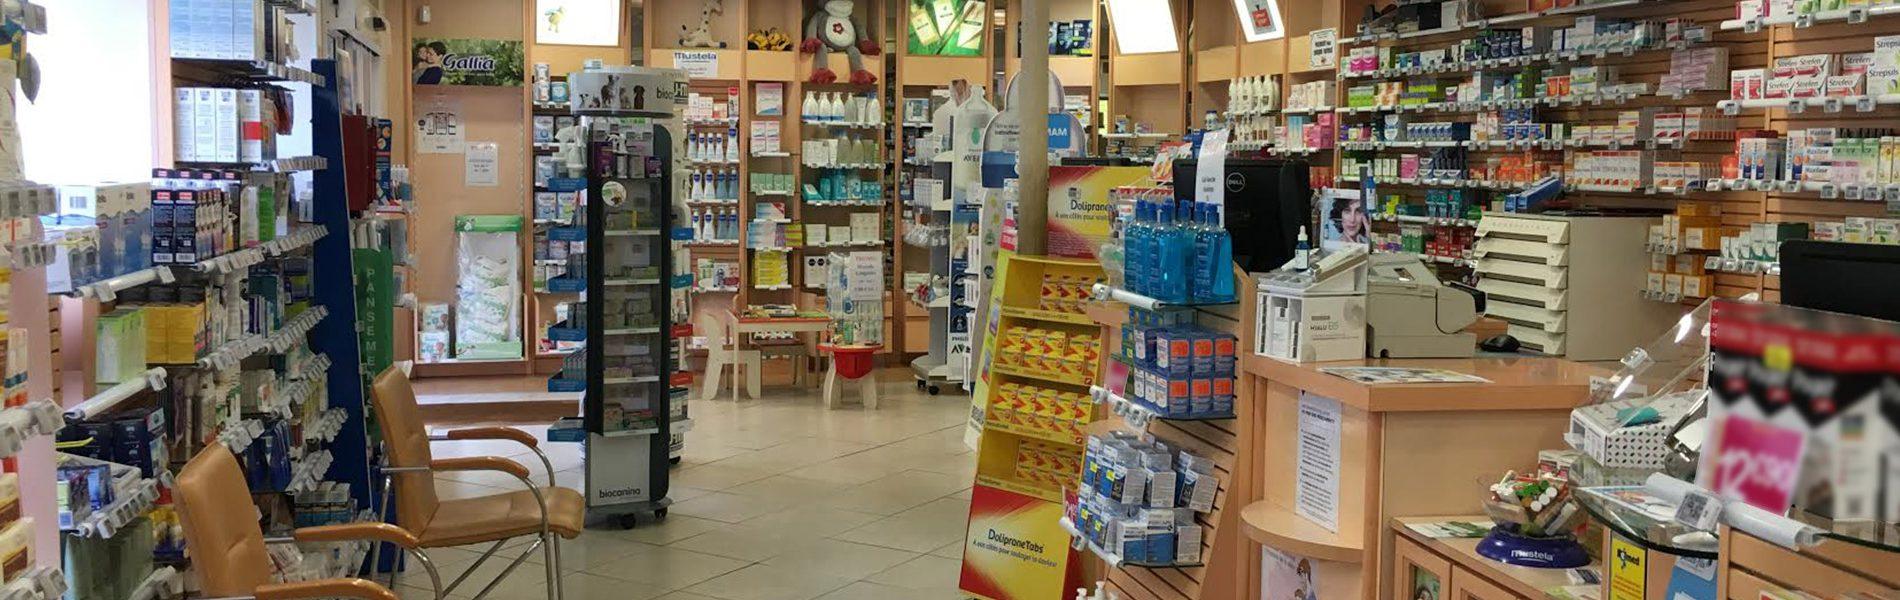 Pharmacie DE LA PIE - Image Homepage 3